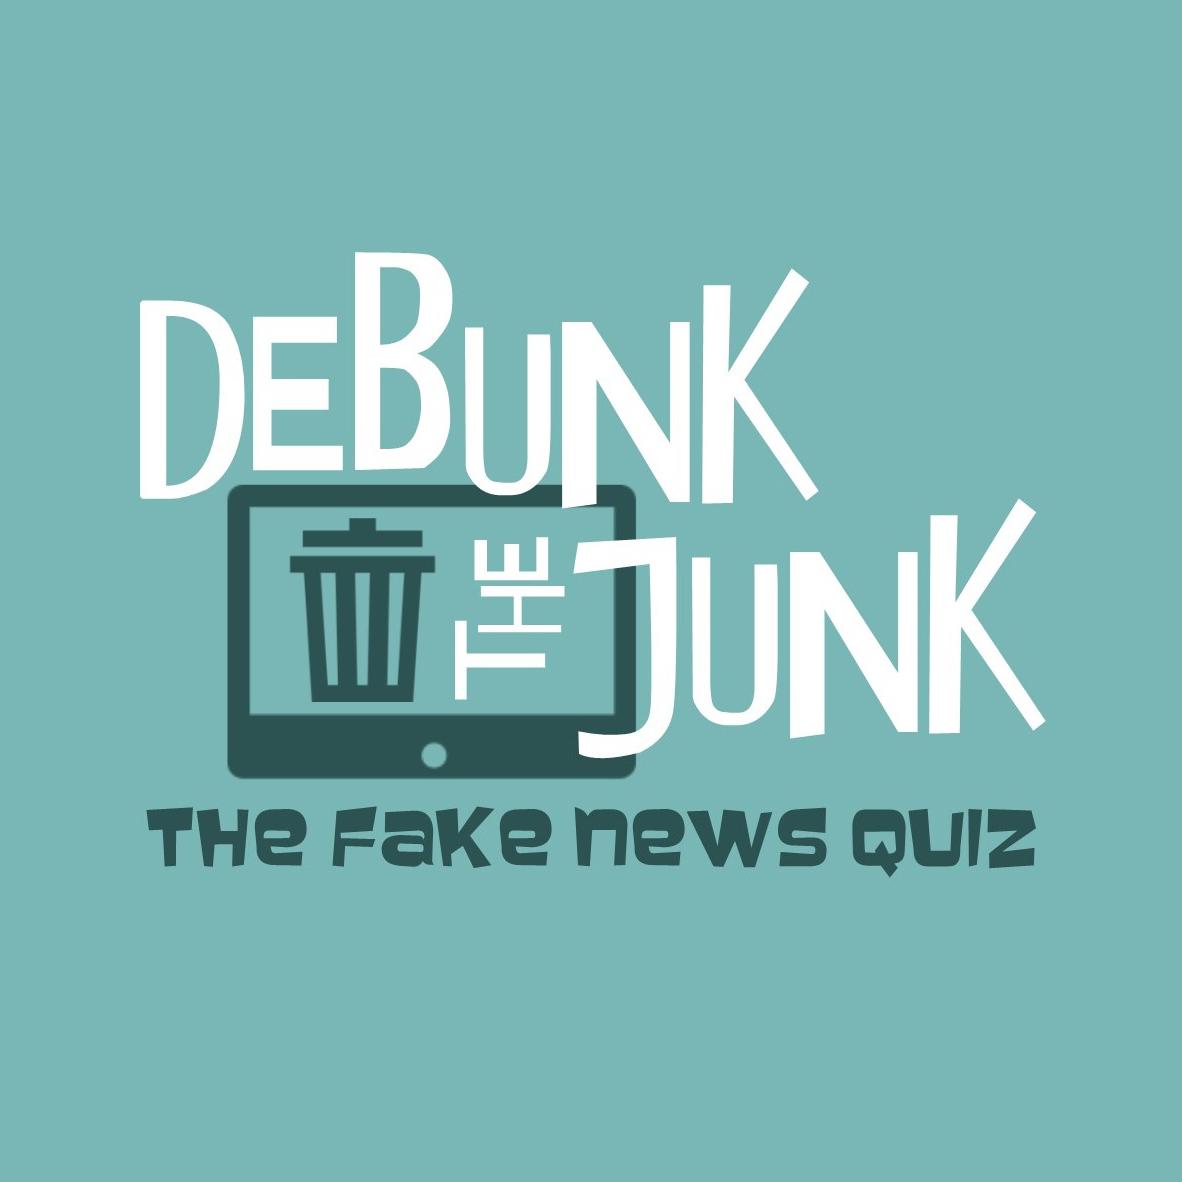 Spartanburg Community College - Debunk the Junk: the Fake News Quiz